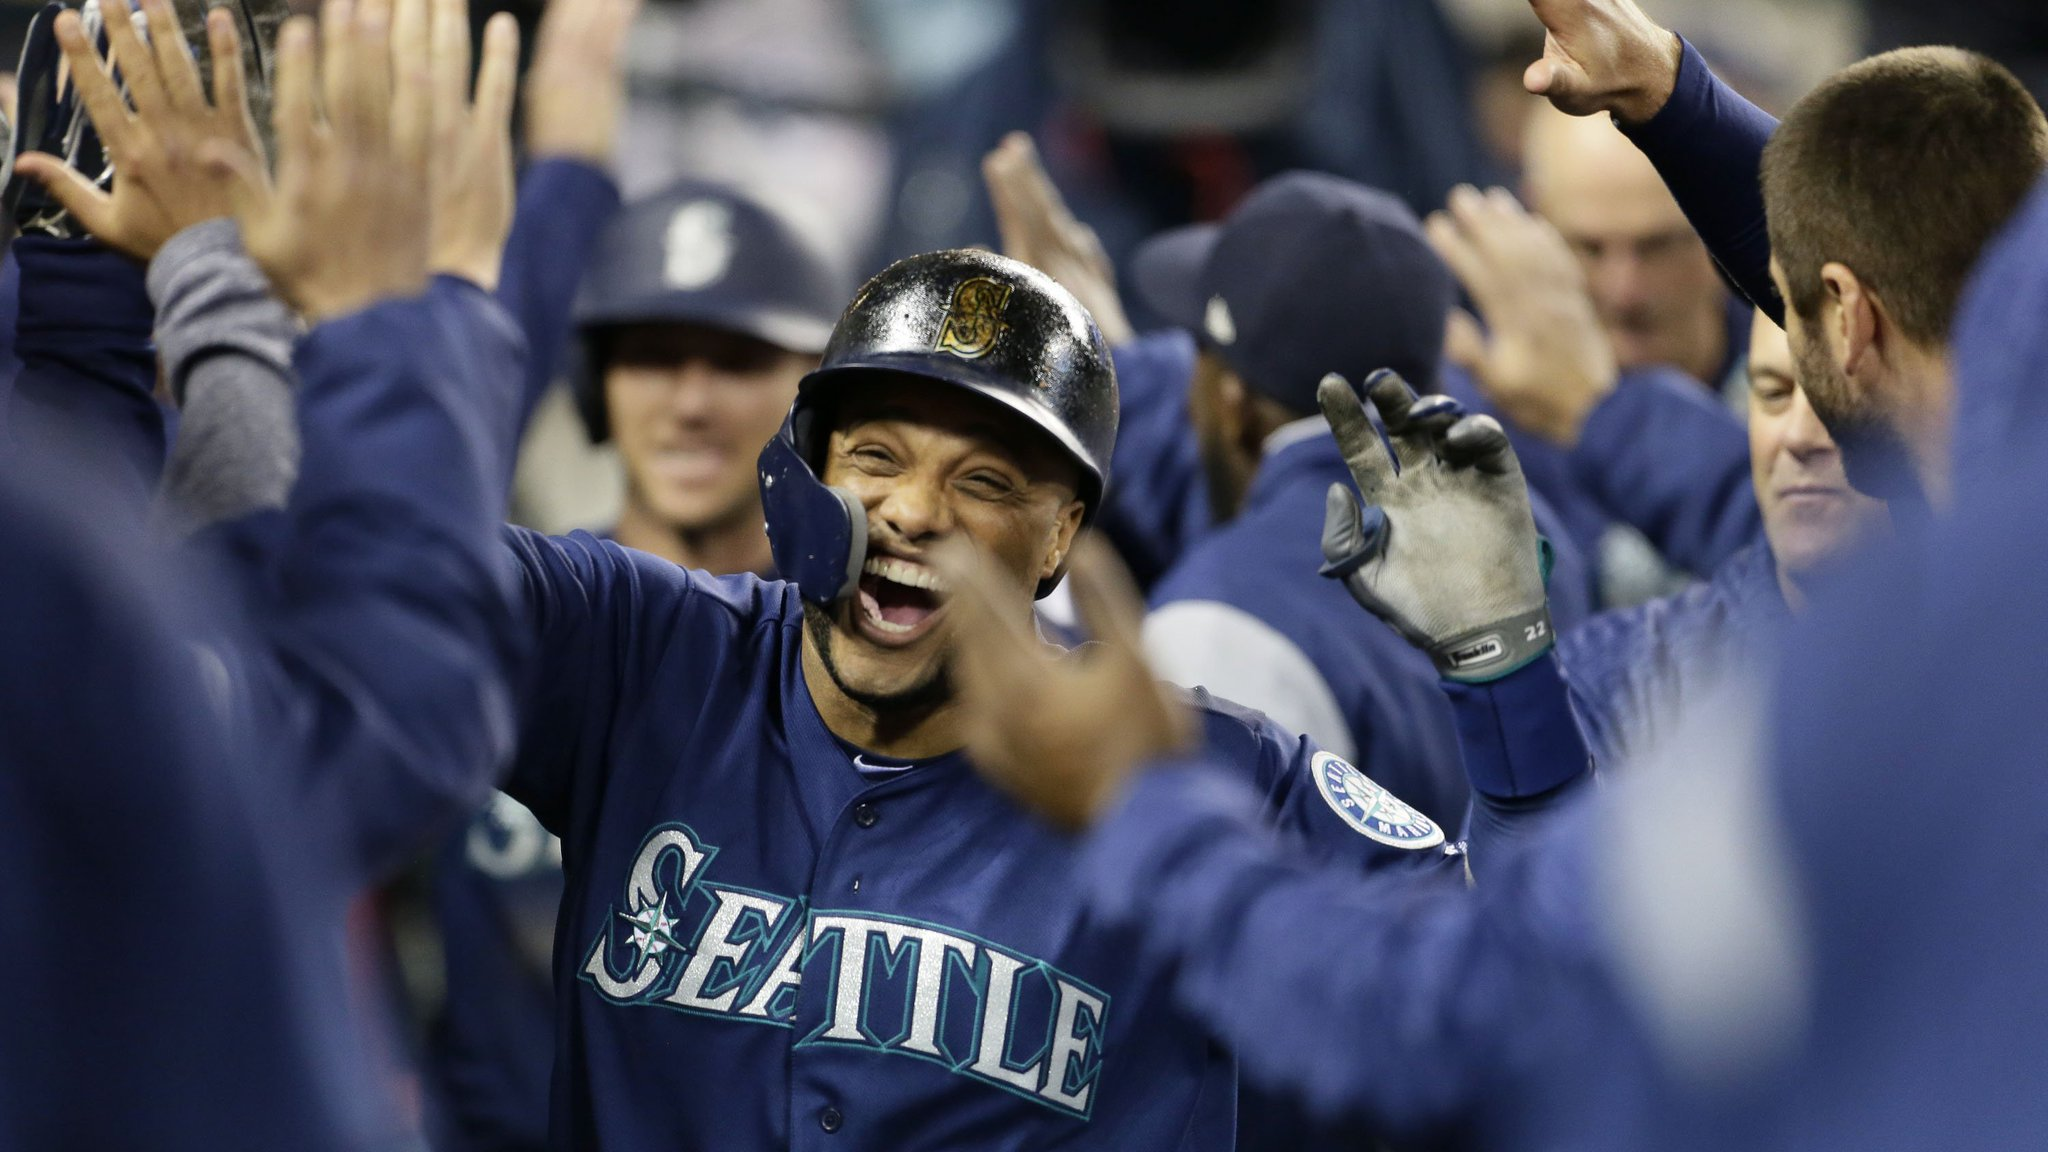 Baseball brings us joy. https://t.co/PCi3u1AJ75